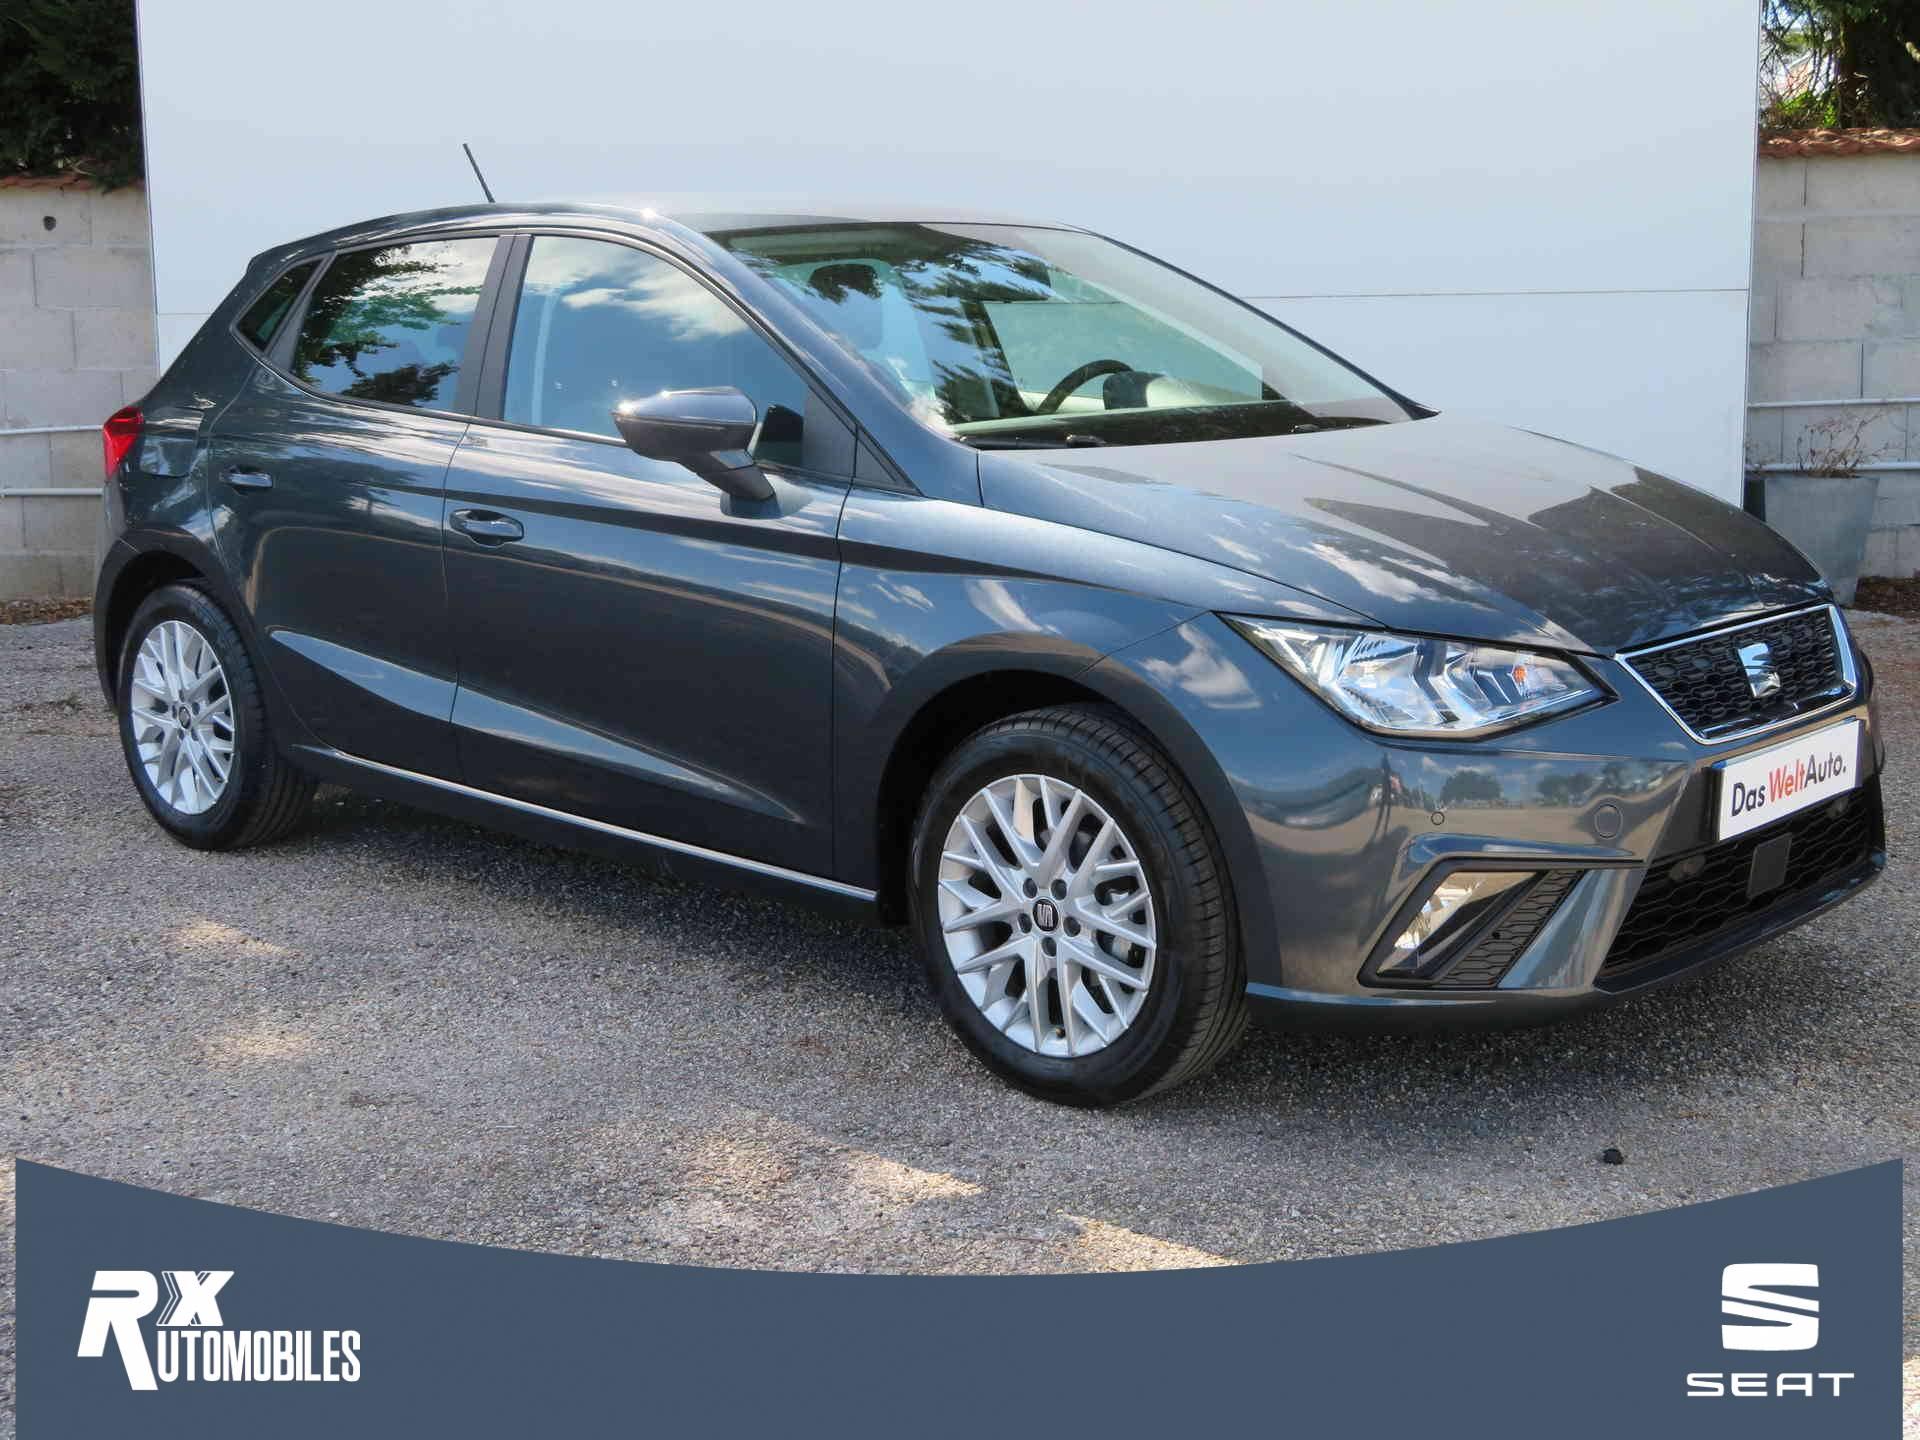 1 - Ibiza 1.6 TDI 95 ch S/S BVM5